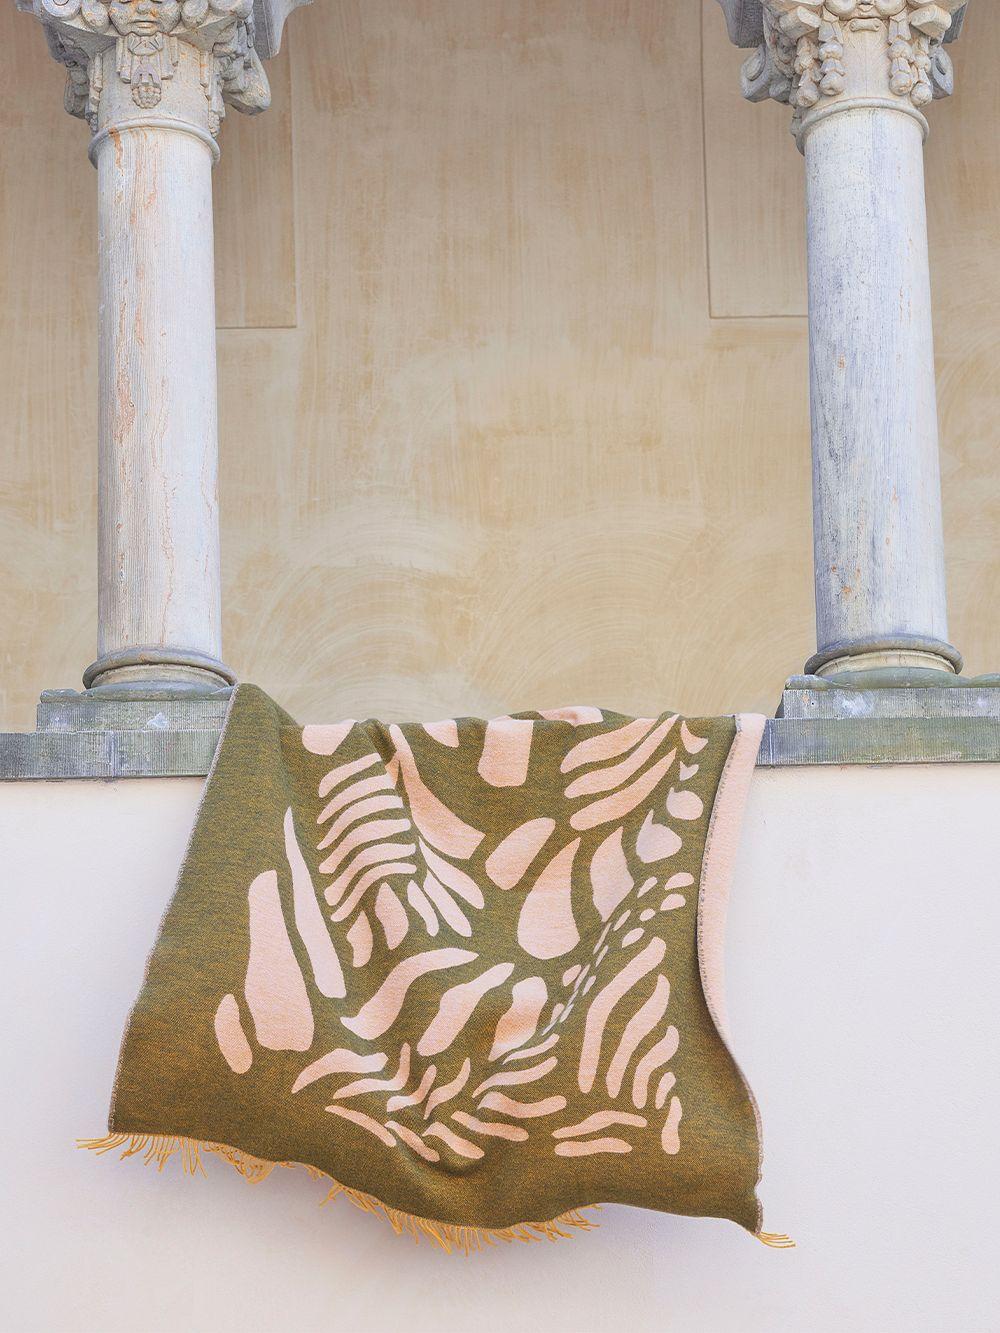 Finarte Väre viltti, 130 x 170 cm, vihreä - pinkki